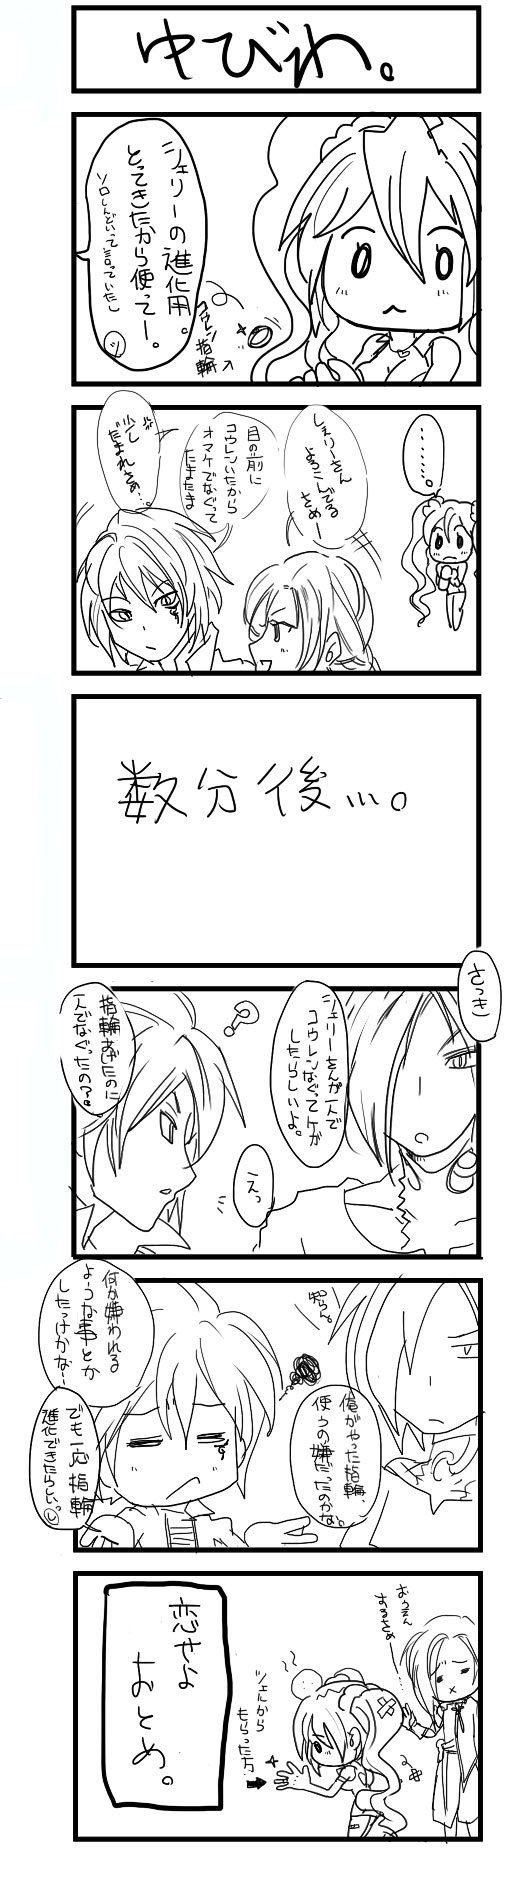 yubiwa_20150704005311dea.jpg